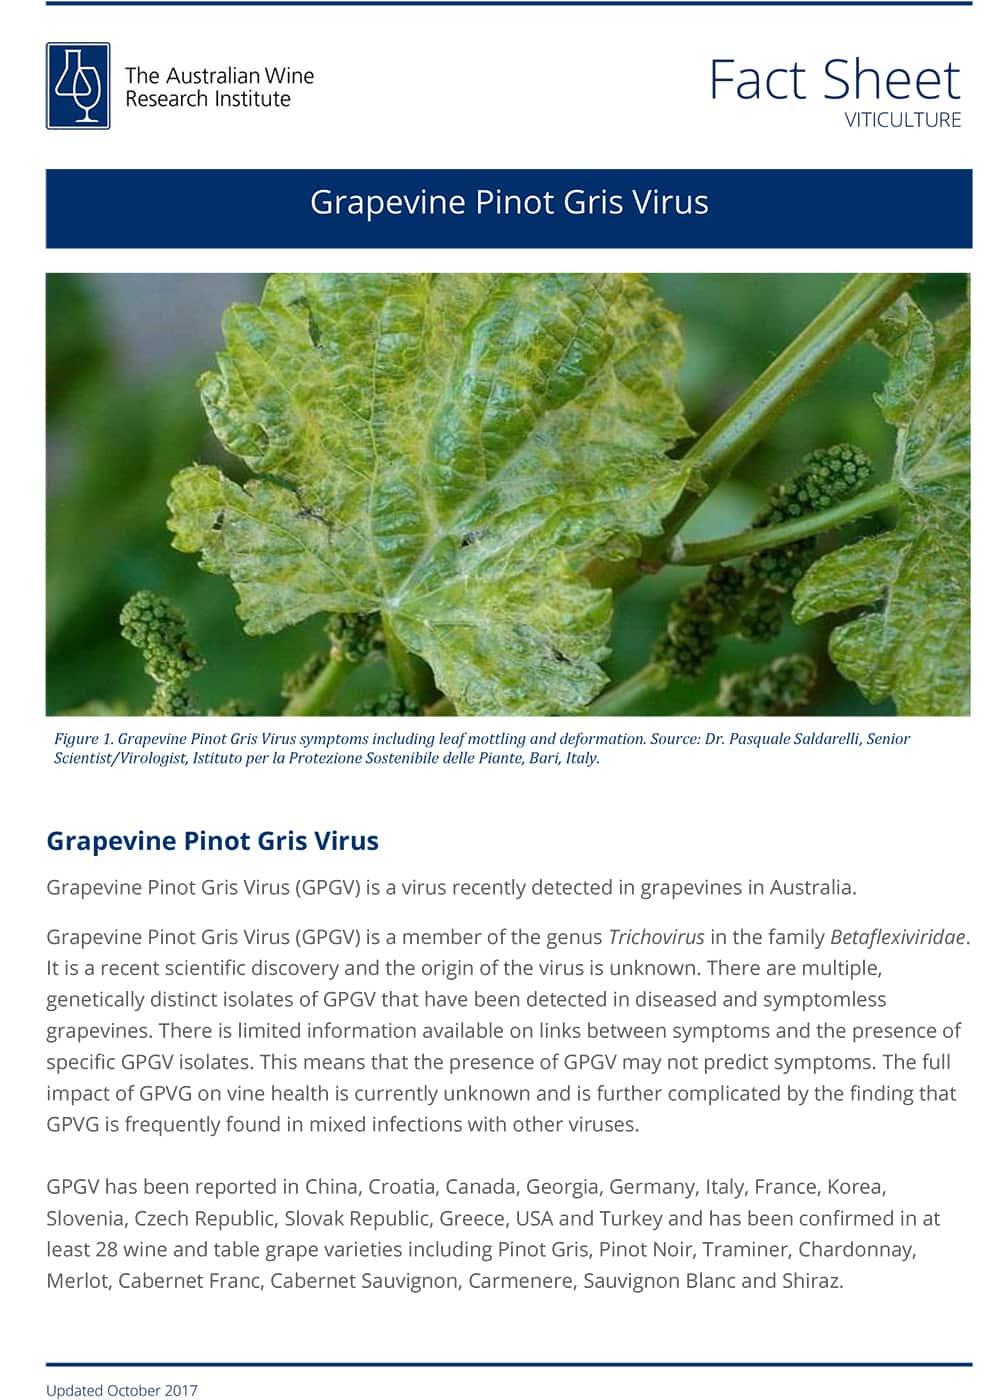 Grapevine Pinot Gris Virus